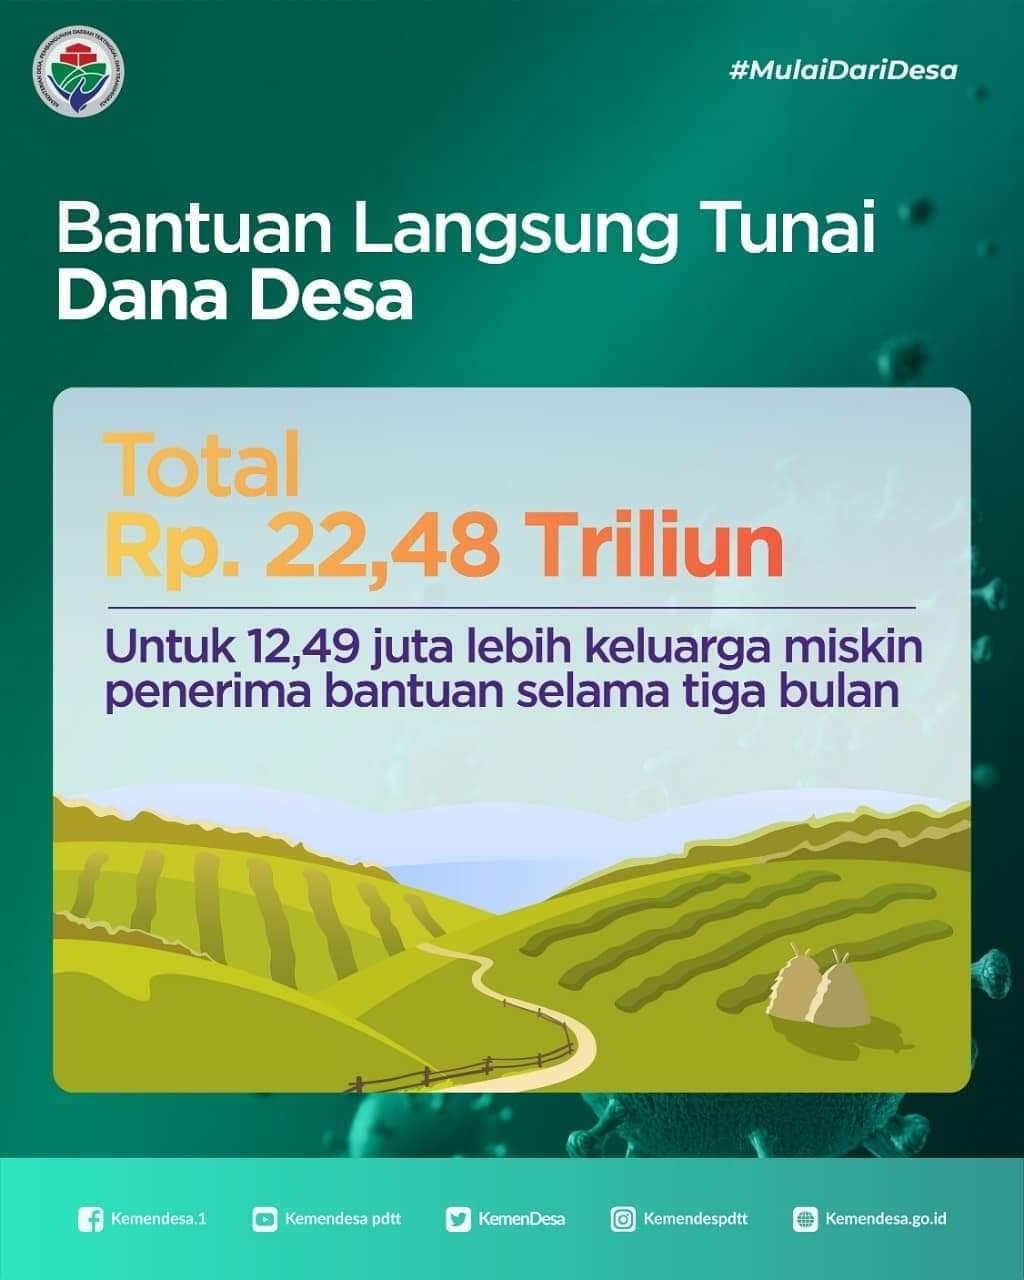 mempermudah penyaluran dana desa guna mempercepat realisasinya Penyaluran BLT Desa selama 6 Bulan berdasarkan PMK 50 Tahun 2020